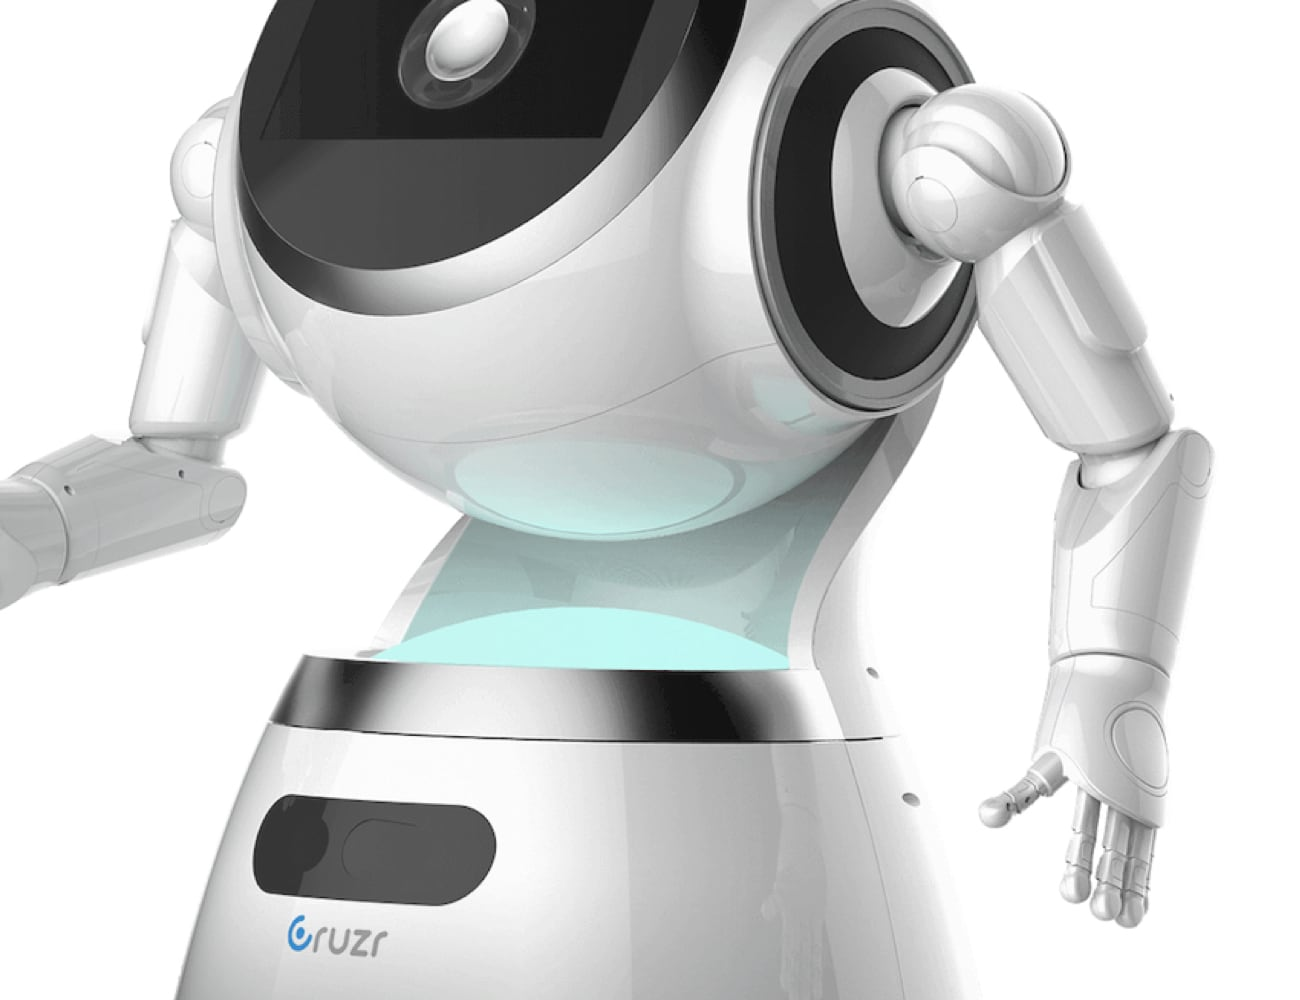 UBTECH Cruzr Intelligent Humanoid Service Robot